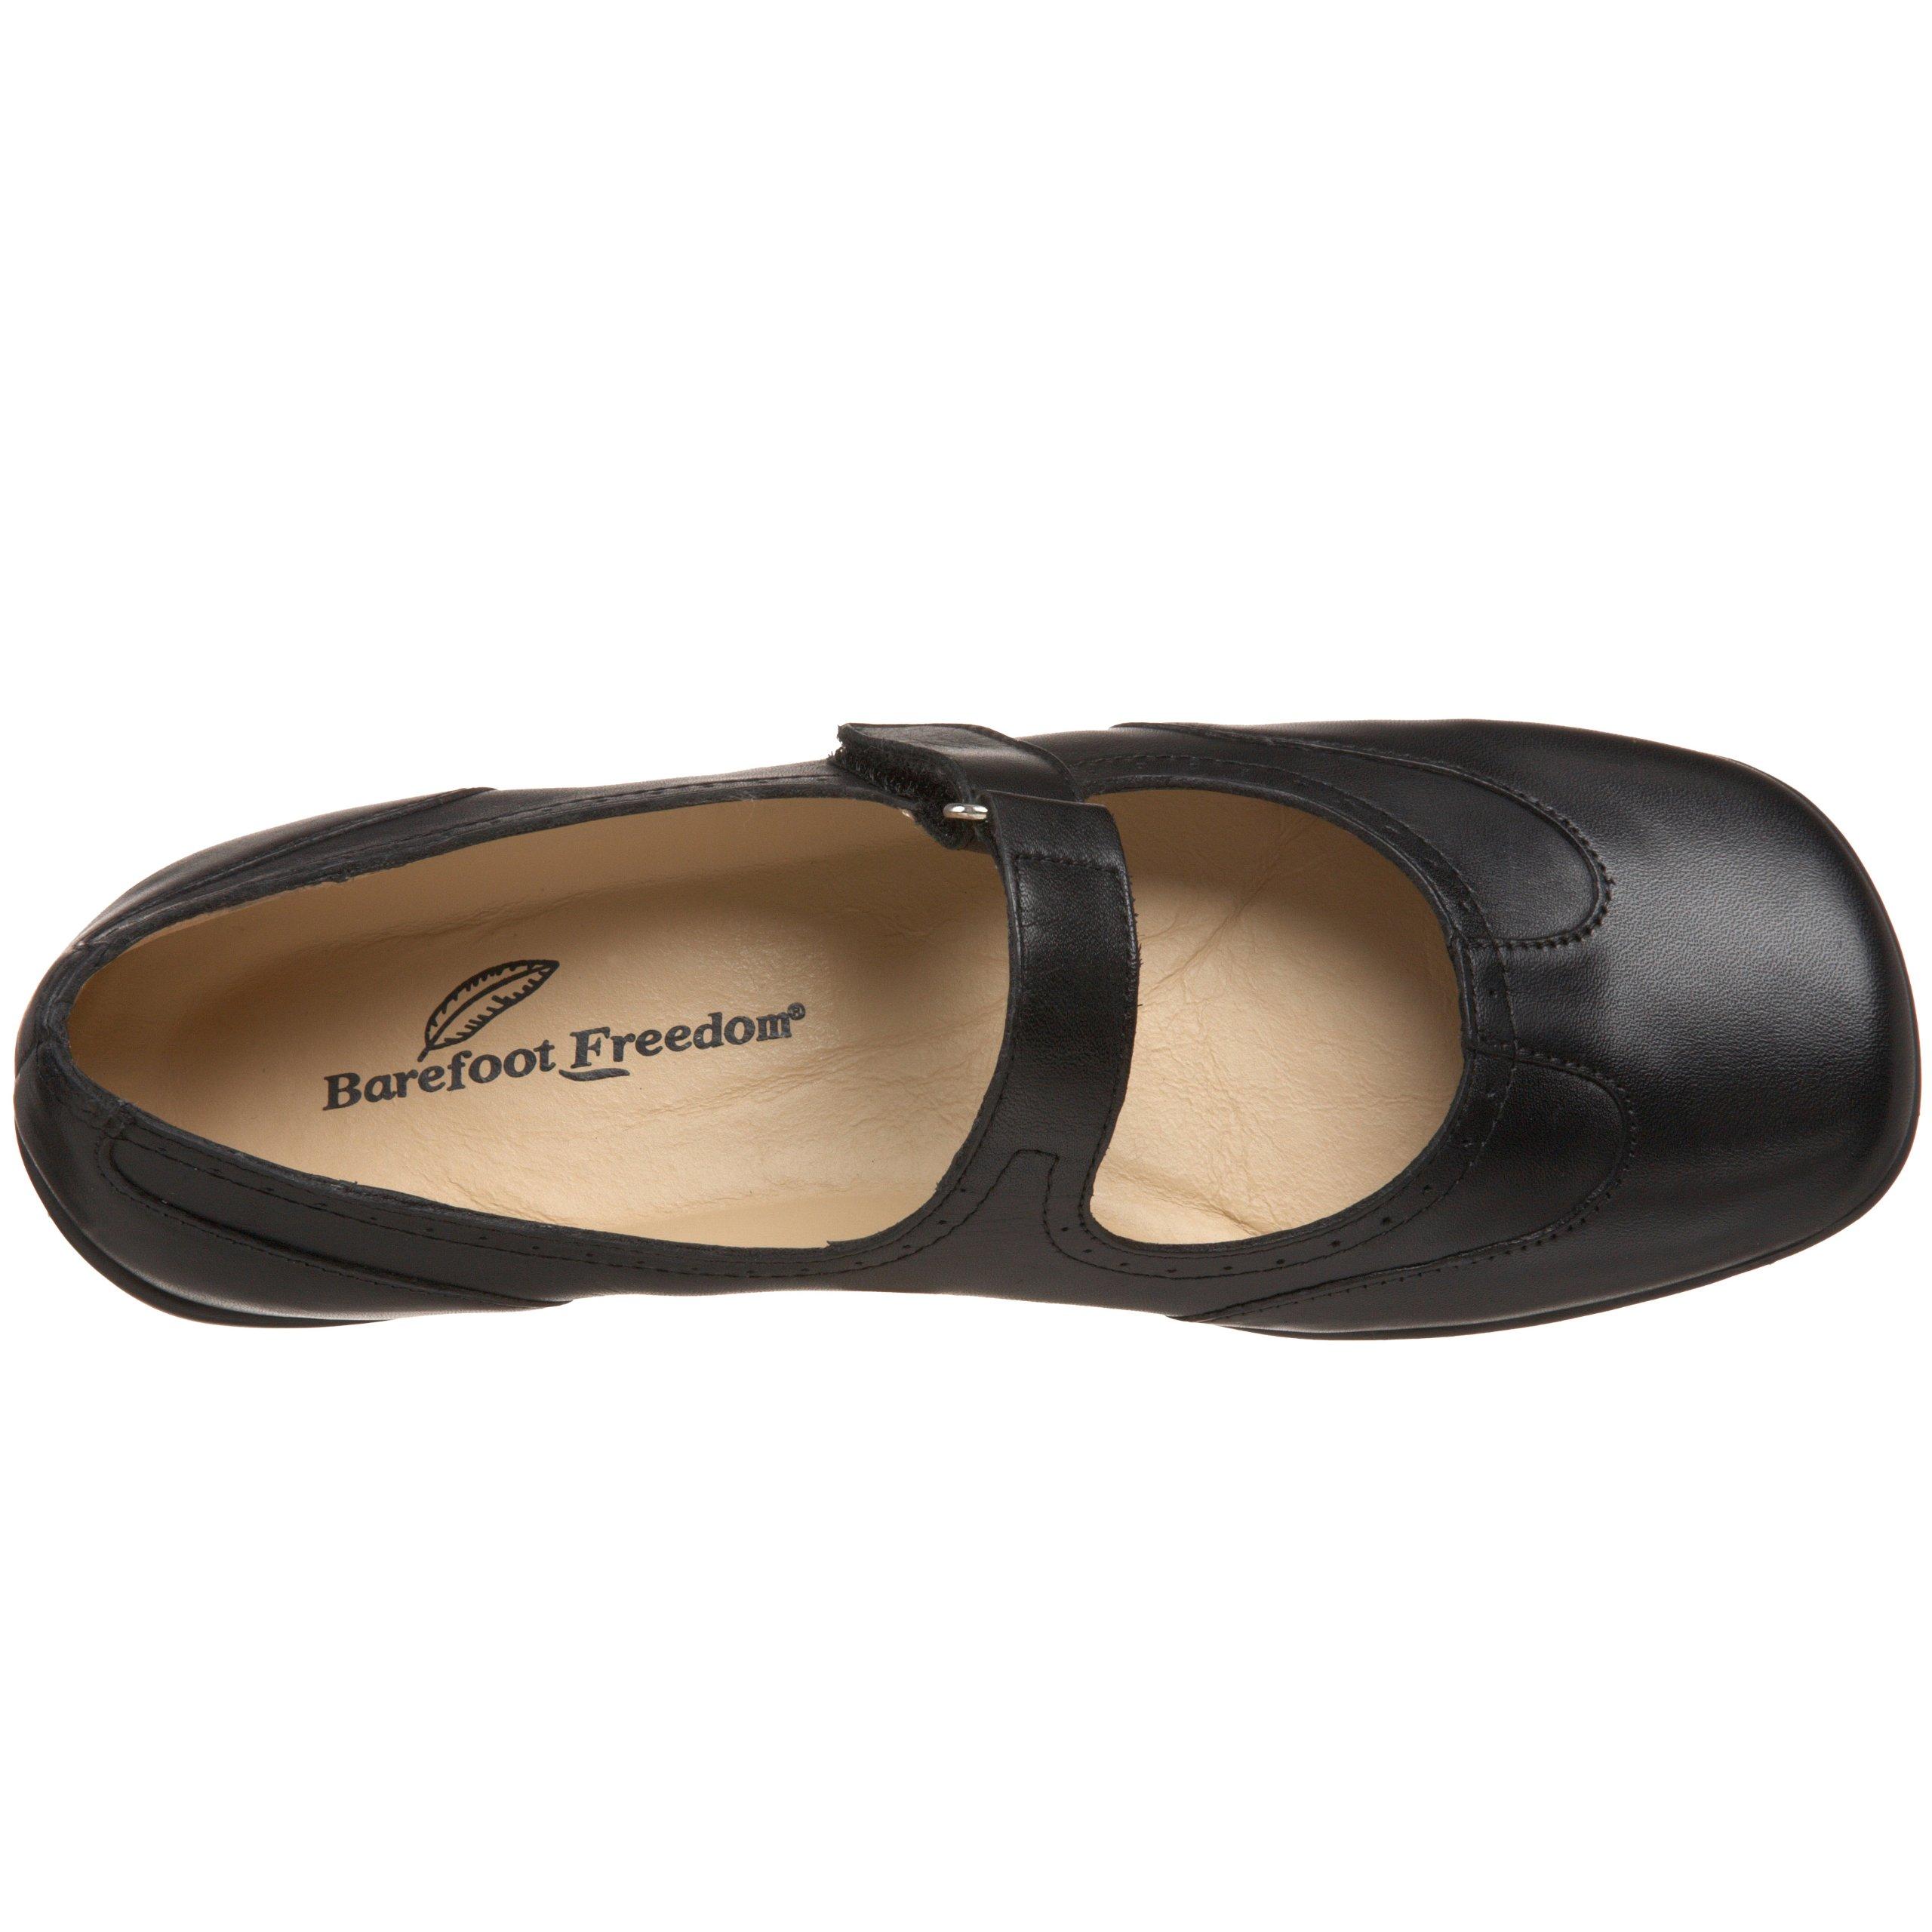 Drew Shoe Women's Isabel Mary Jane,Black Leather,6 W US by Drew Shoe (Image #7)